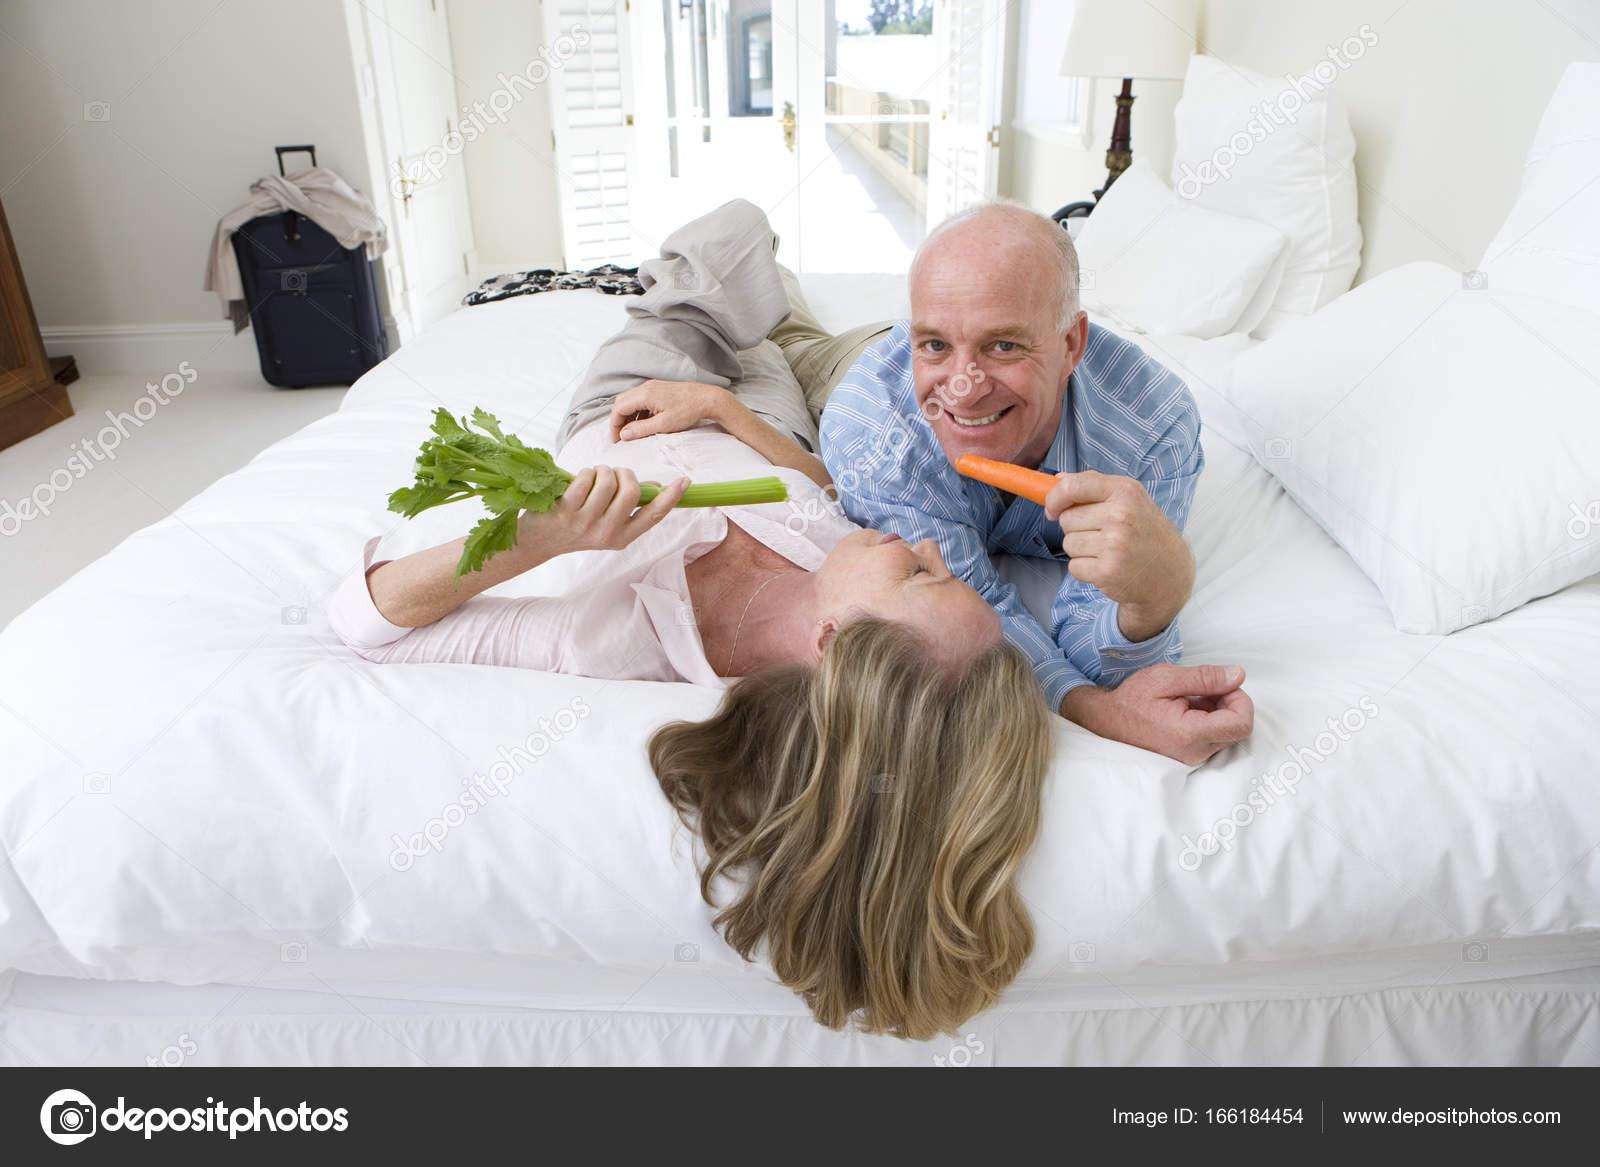 want buffie den Körper Porno-Videos name gina. Cool laid